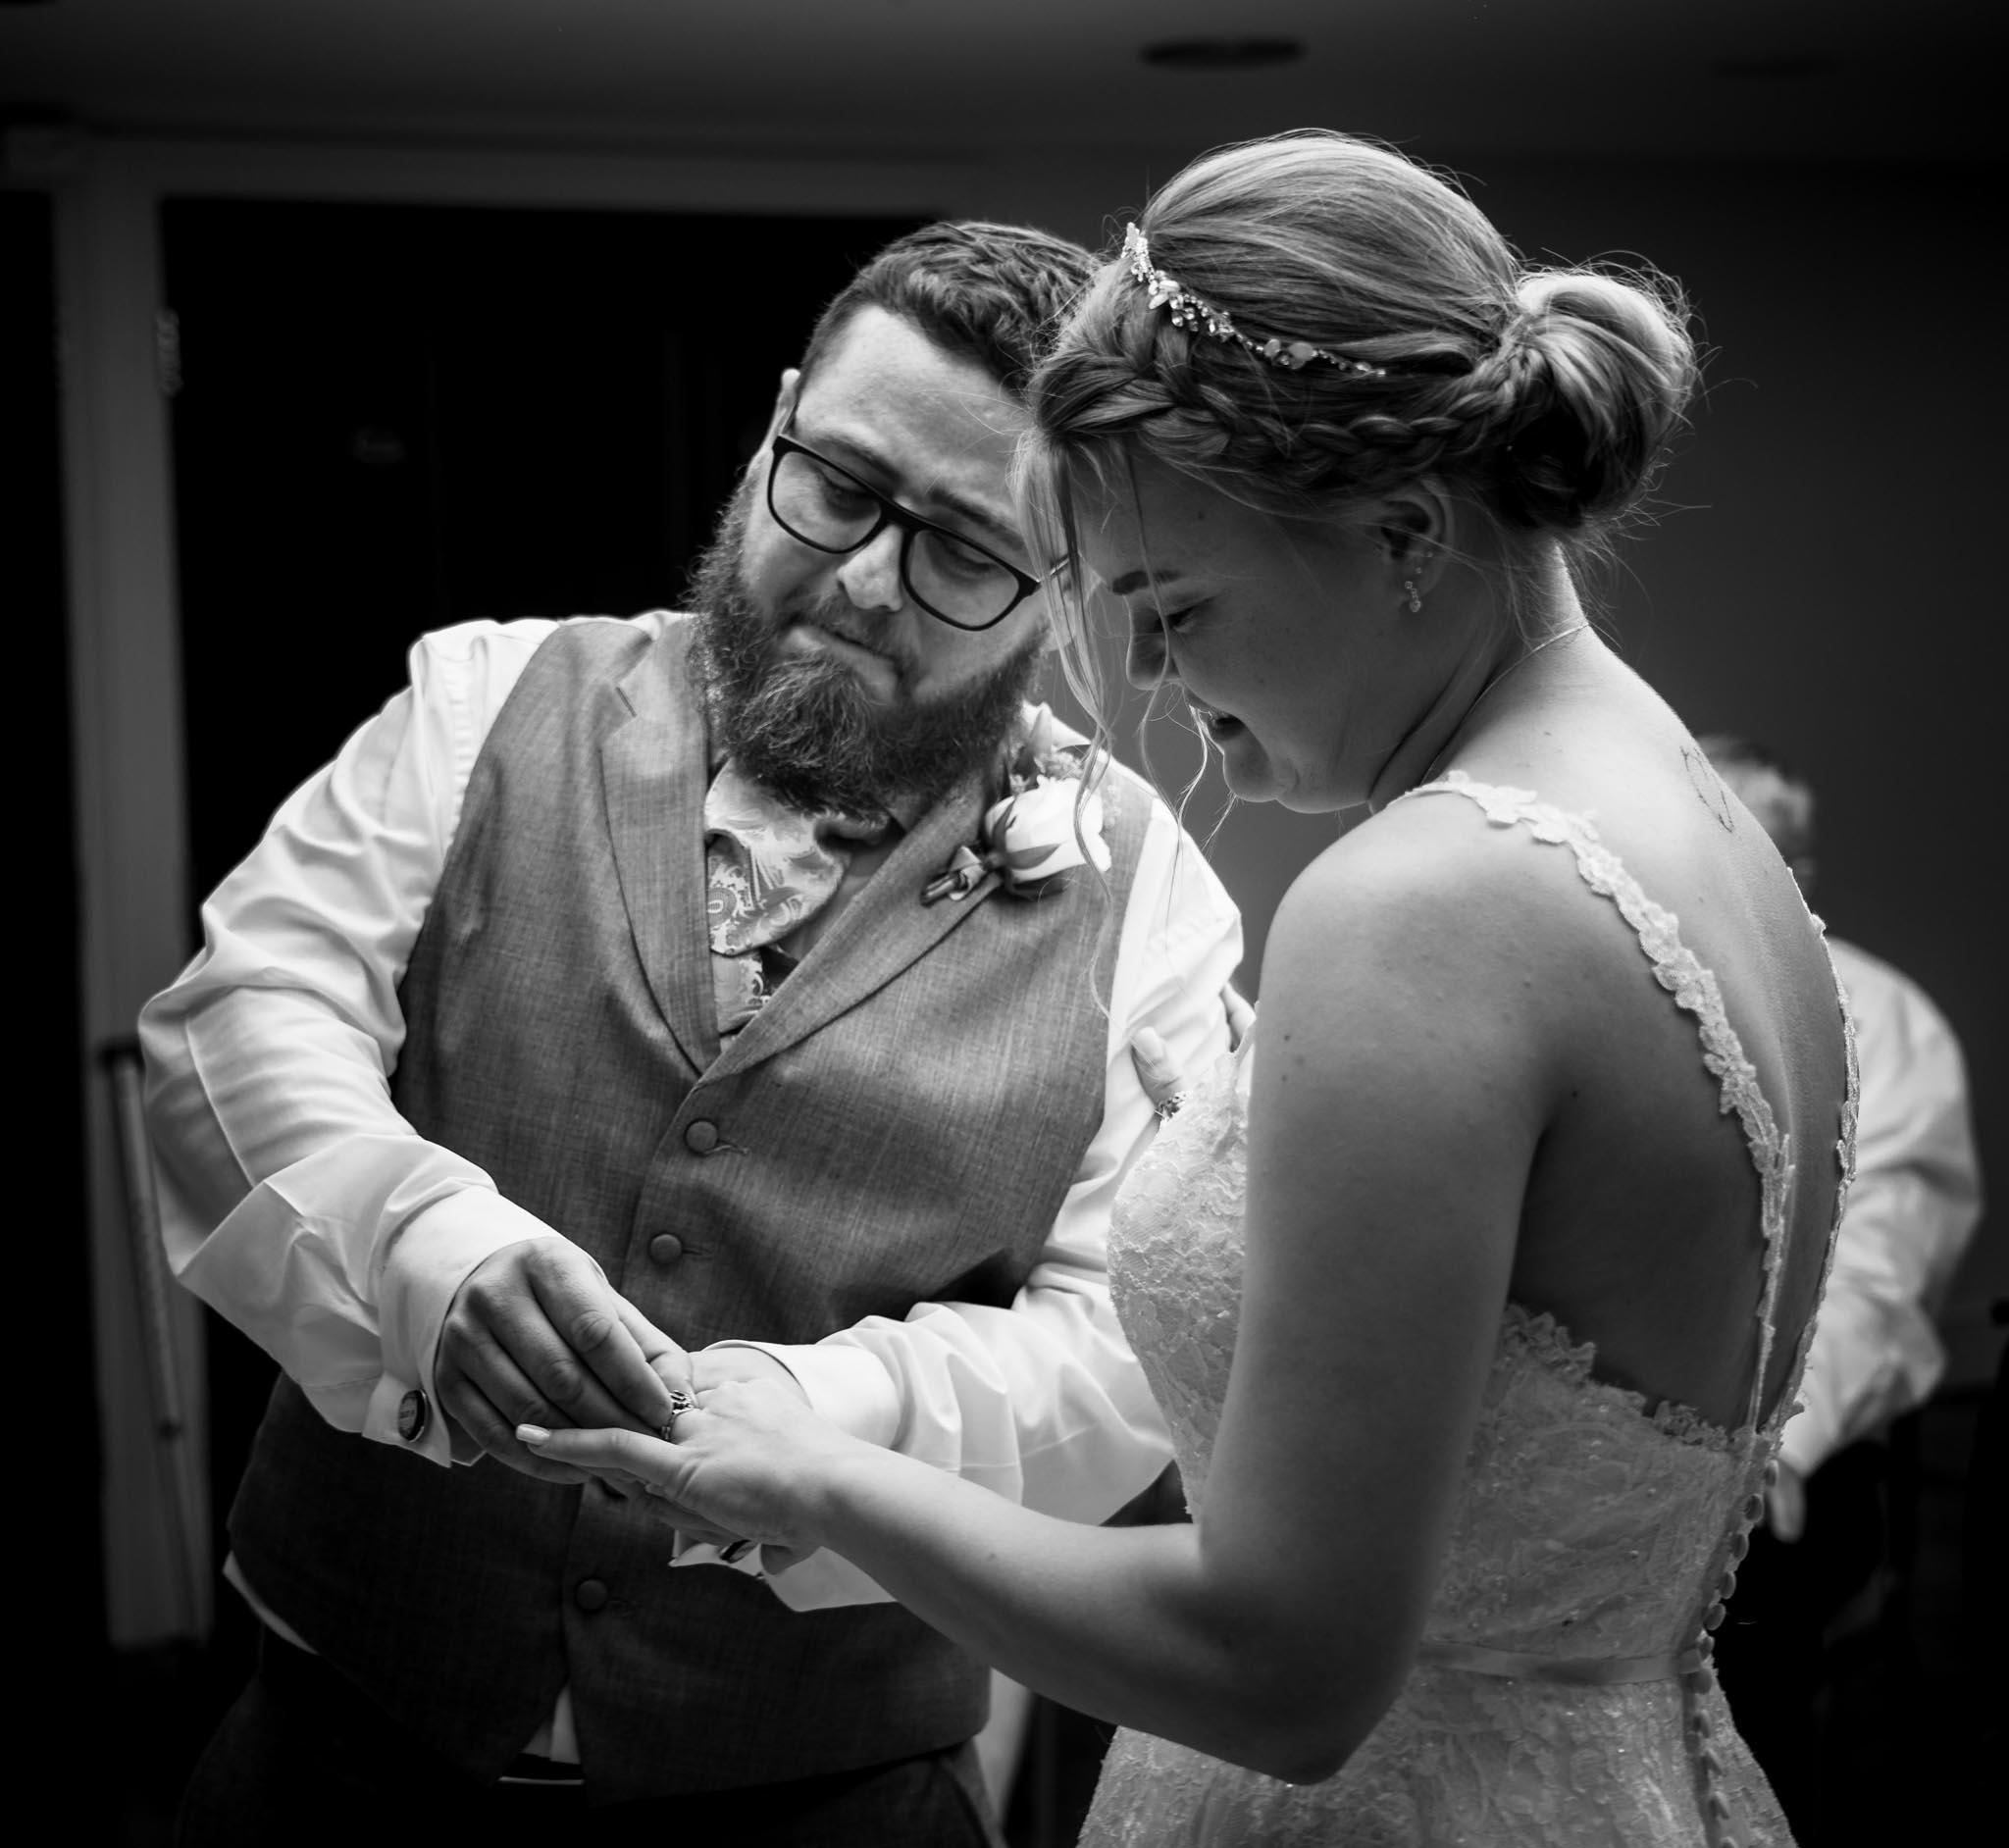 420-Ceremony-Luke-Yasmin-The-Rayleigh-Club-Wedding-Photography.jpg